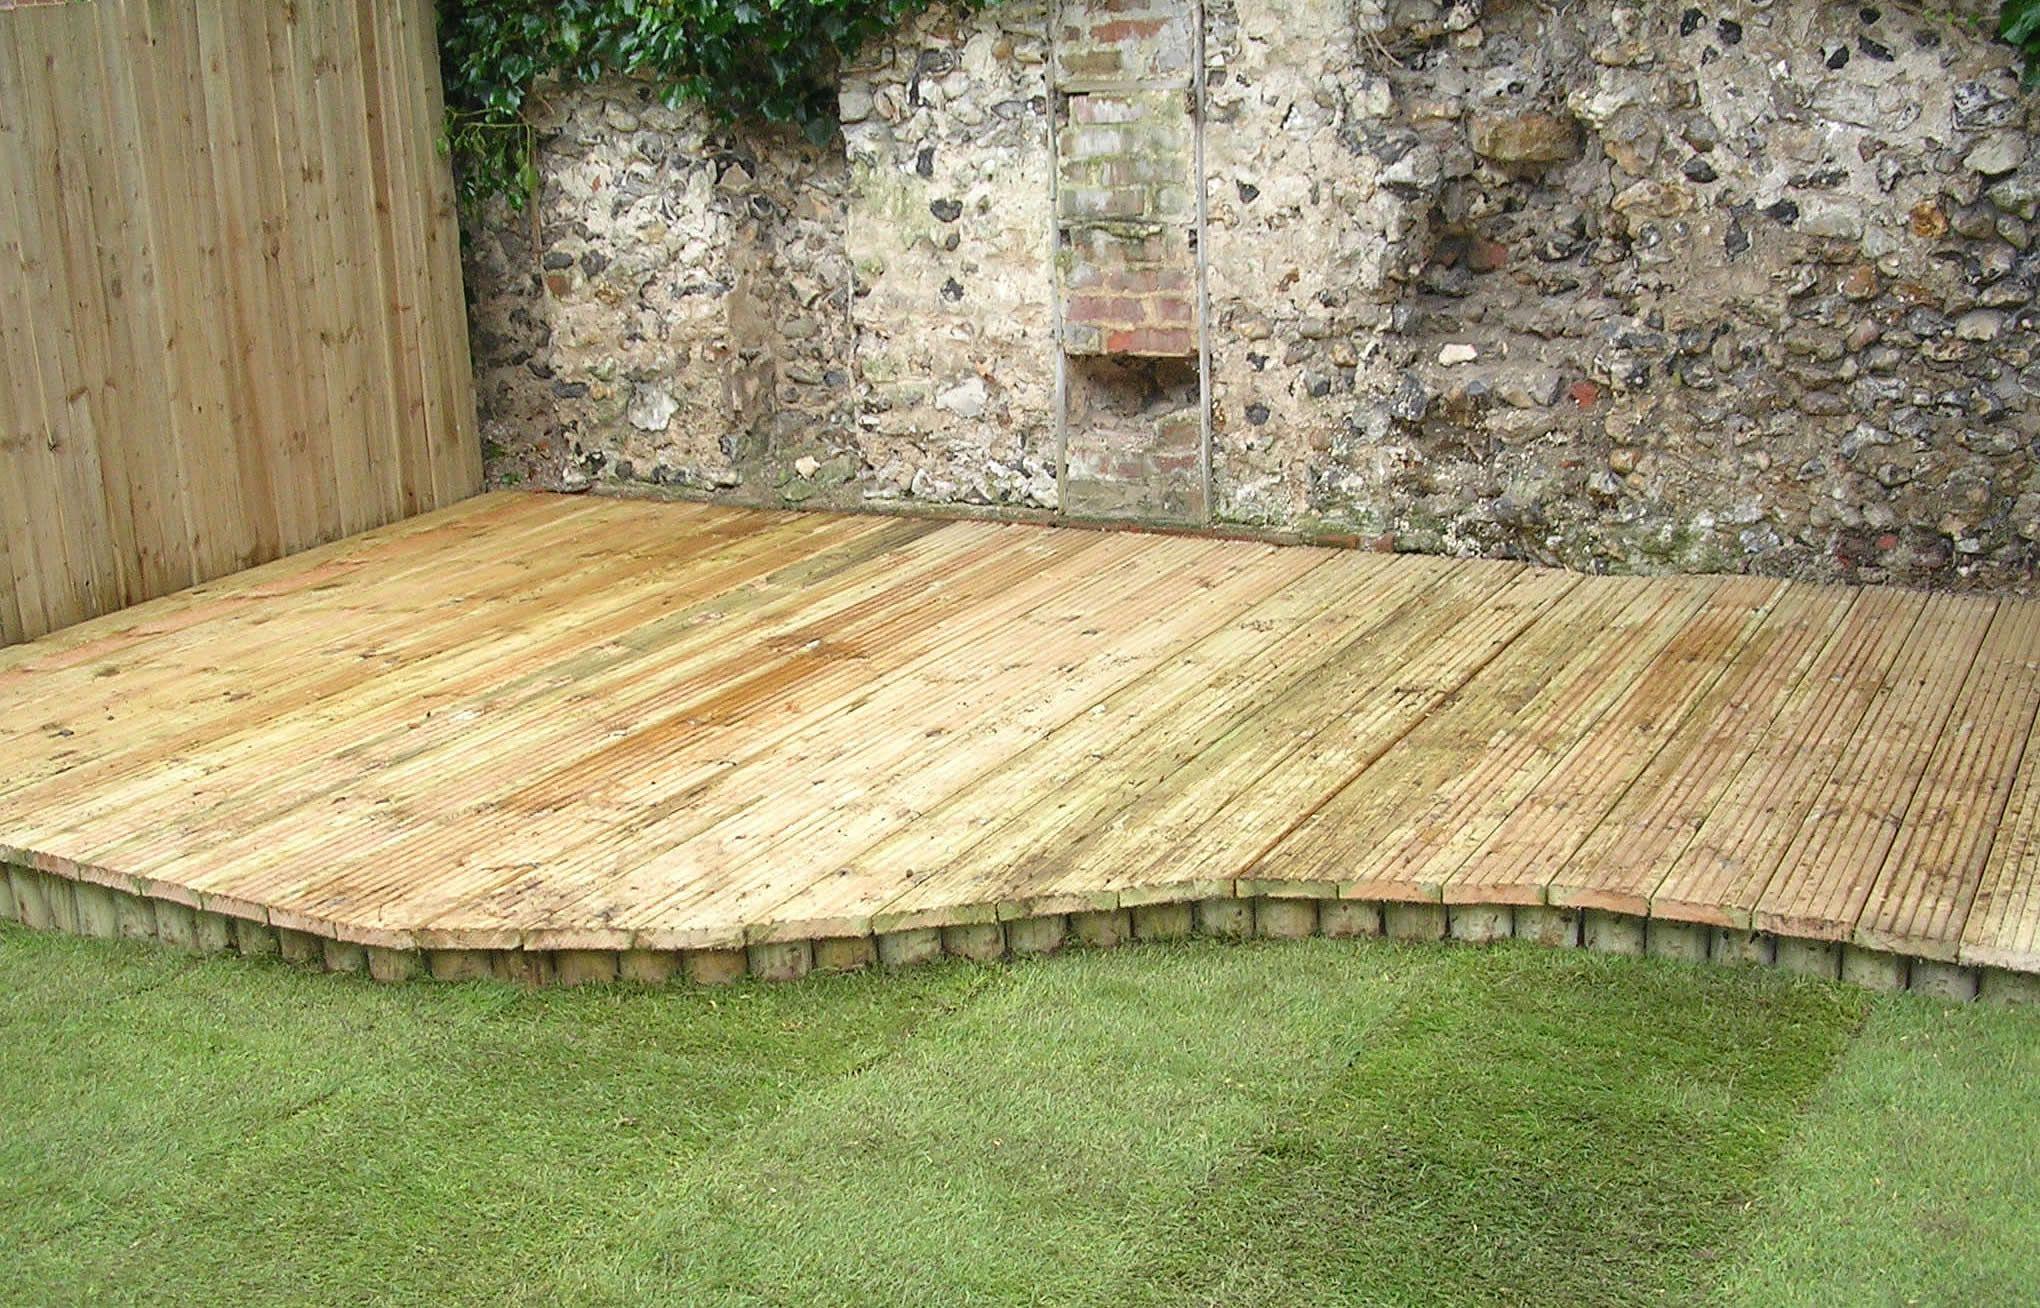 Timber Decking... Visit us: www.steelheadconstruction.com/about-us ...